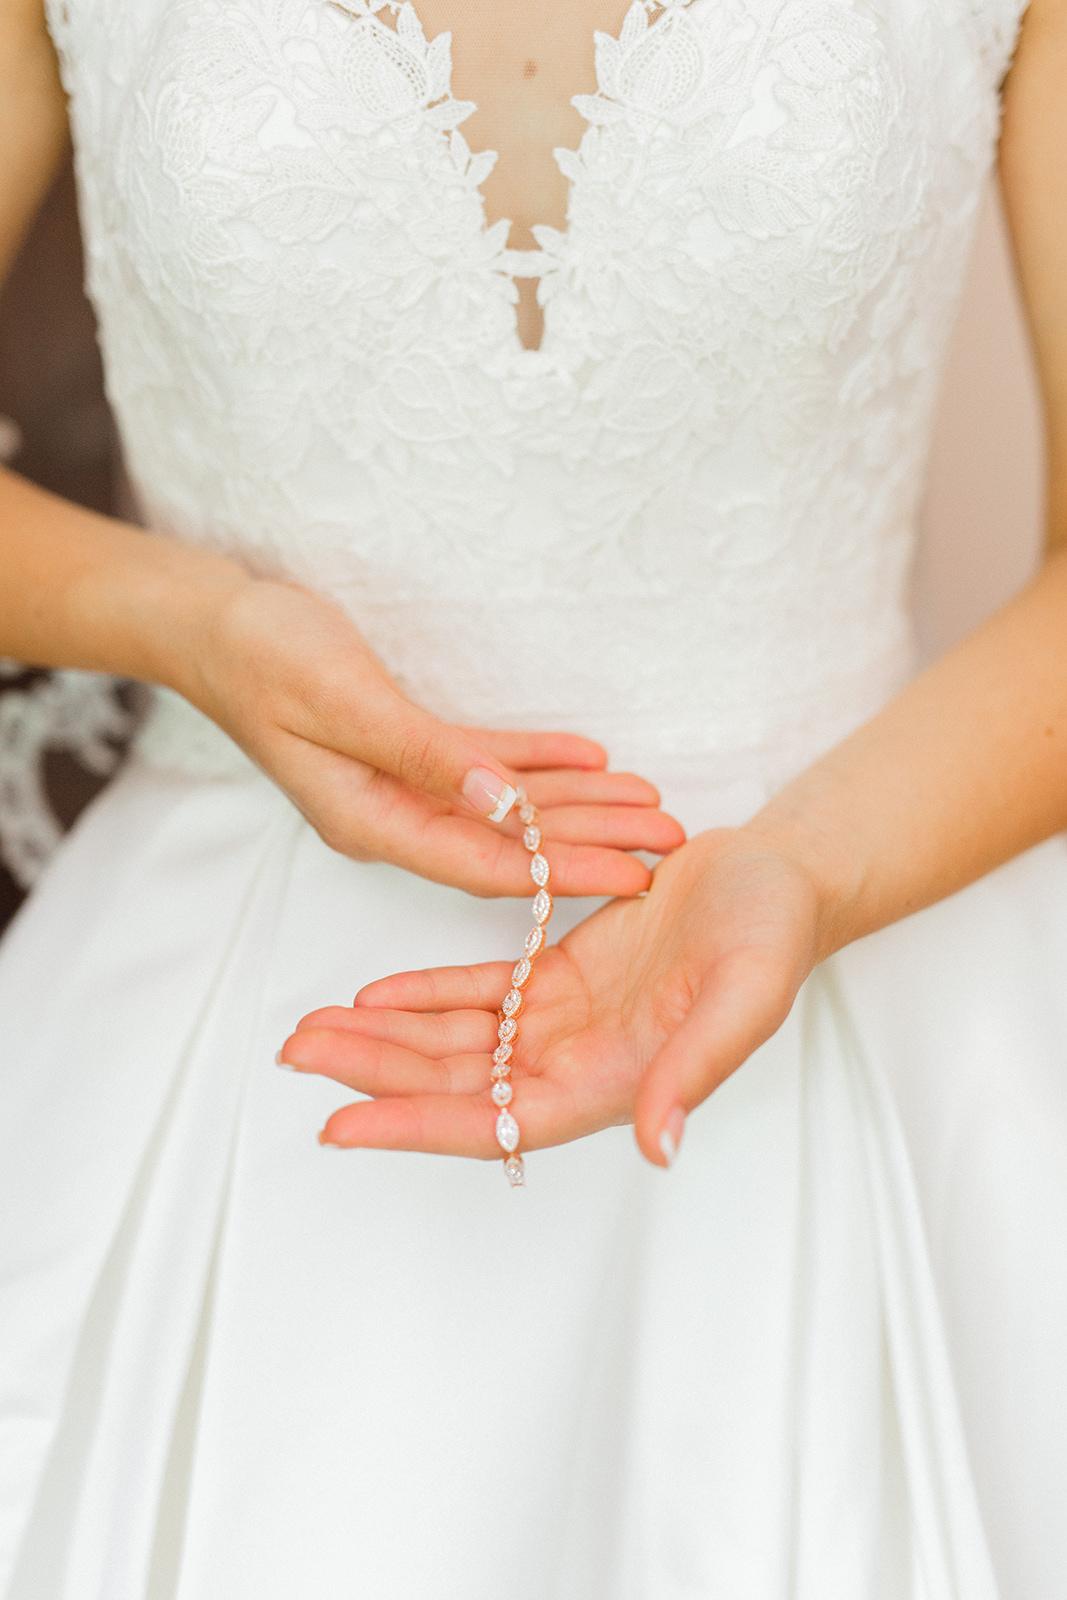 Ushers_Ferry_Cedar_Rapids_Wedding_Ella+Phil-0231.jpg